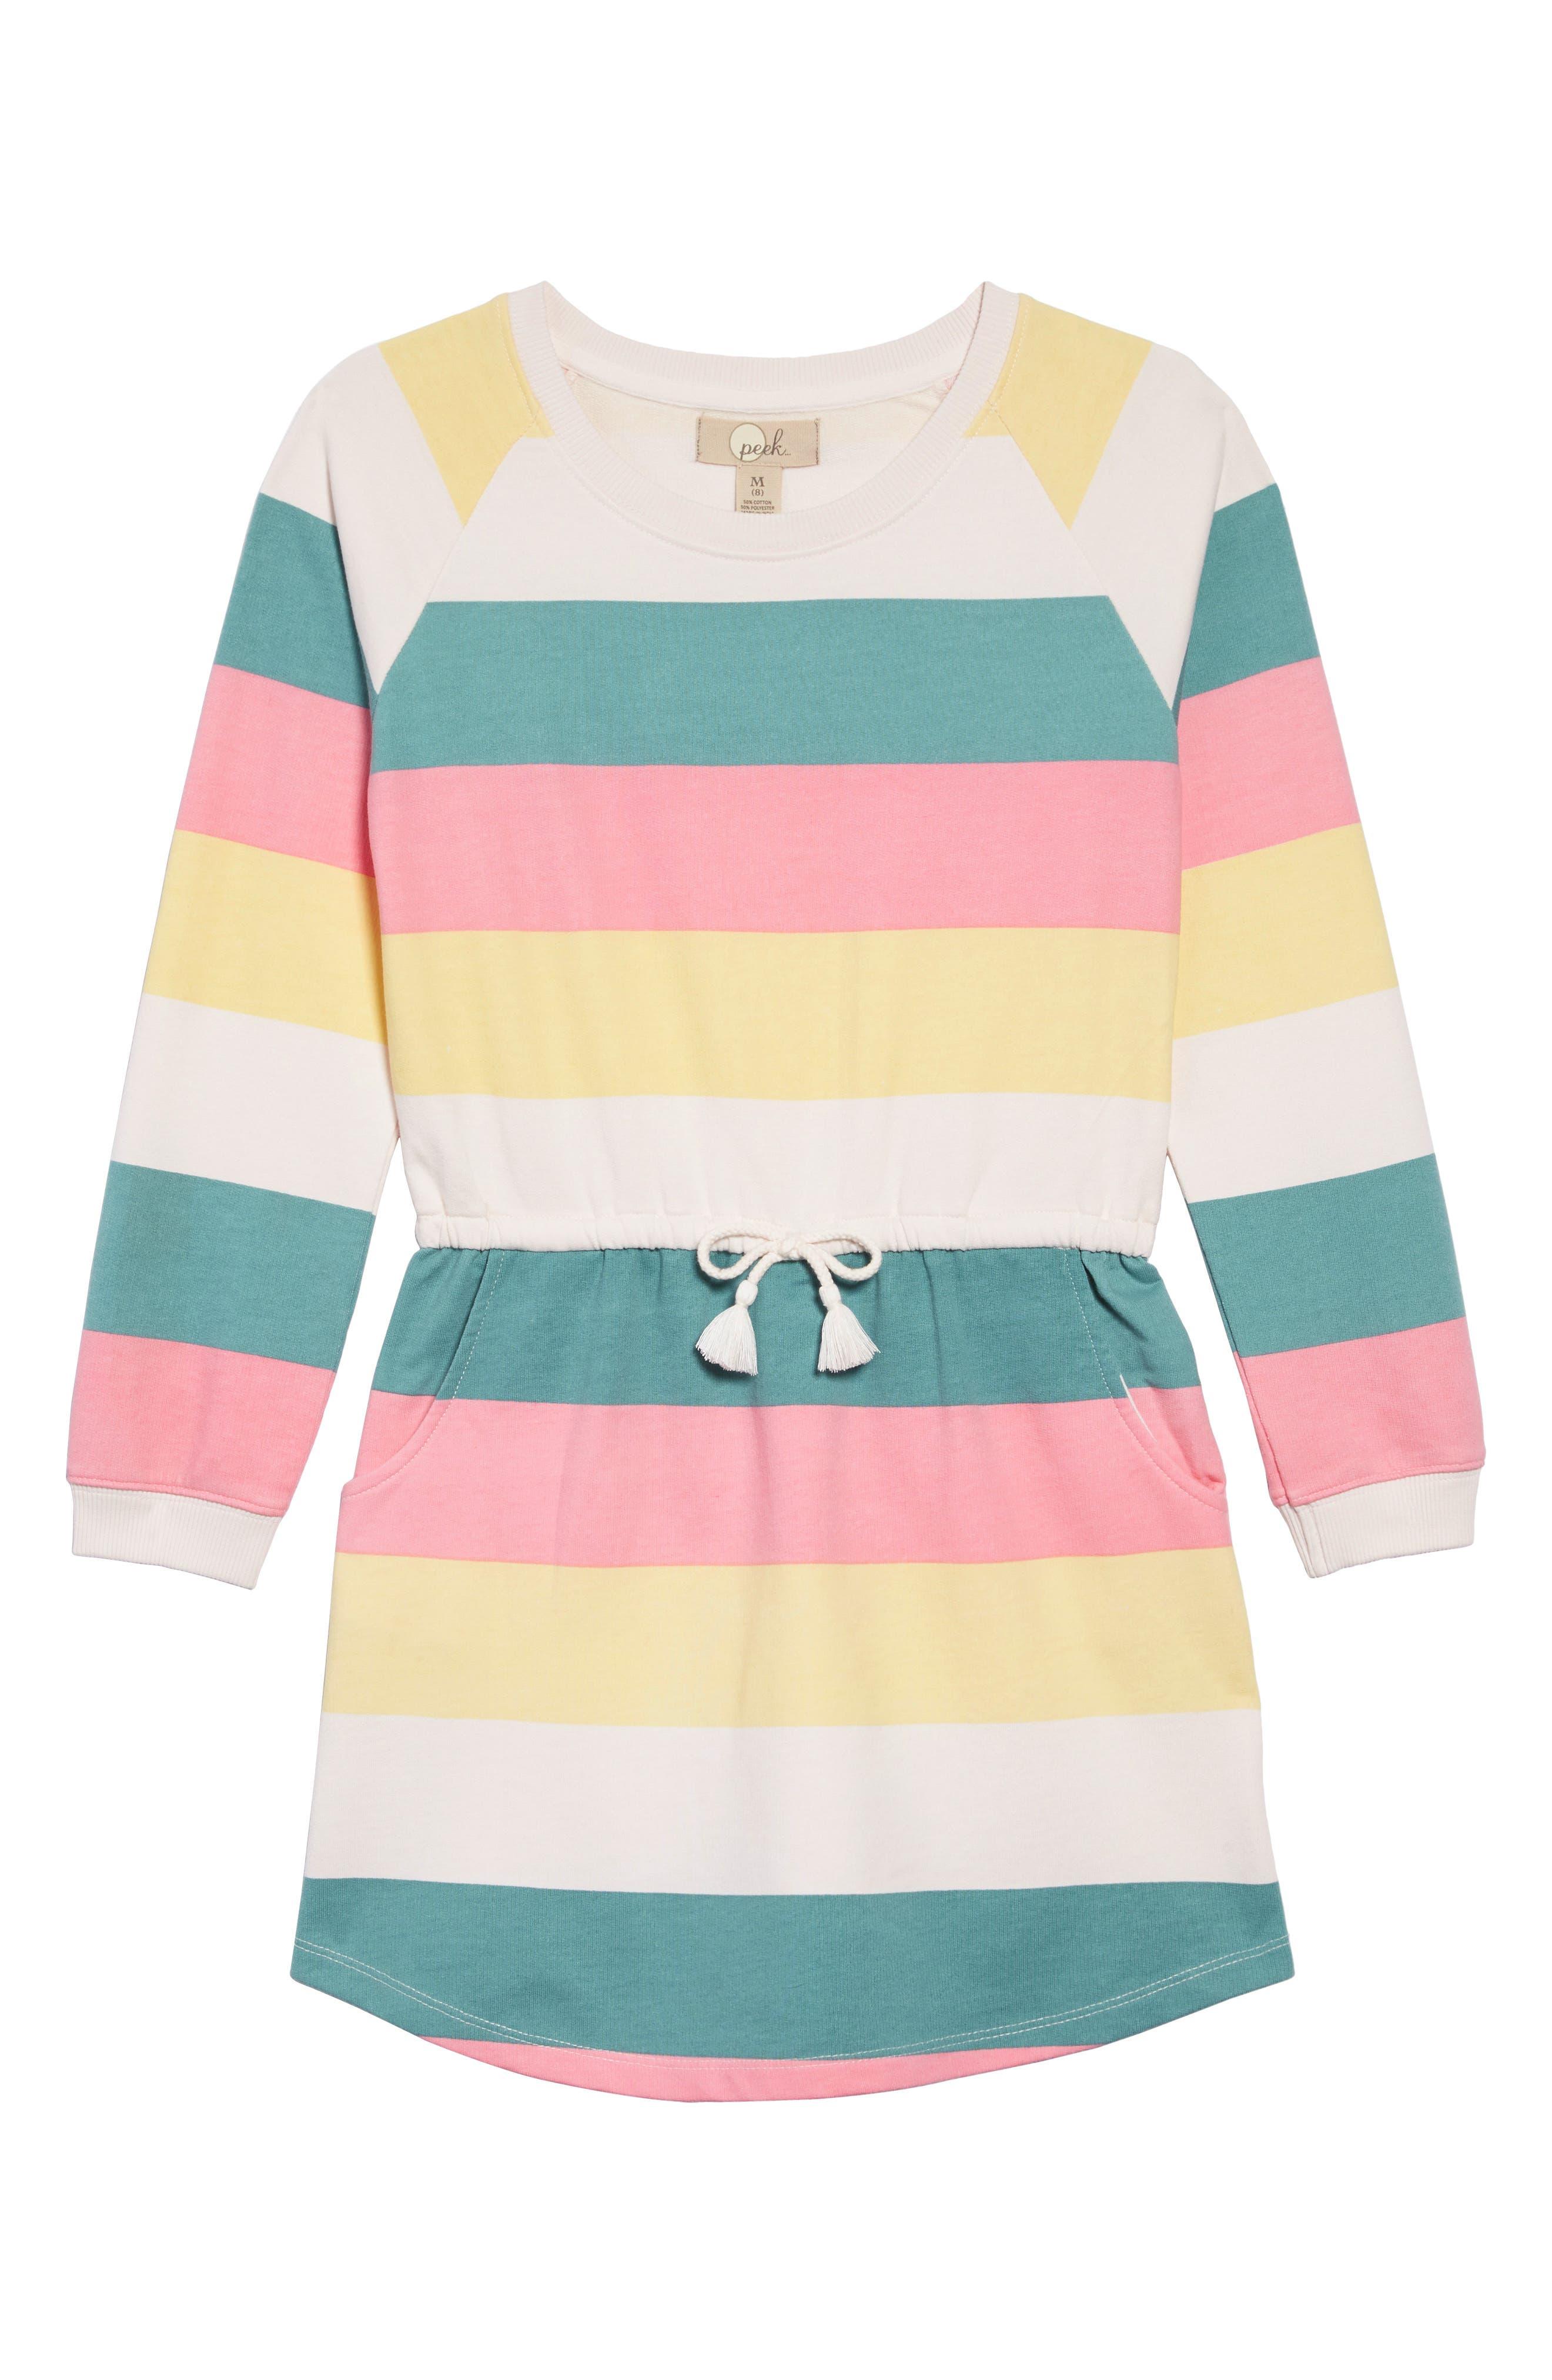 PEEK AREN'T YOU CURIOUS Brynn Stripe Sweatshirt Dress, Main, color, 650